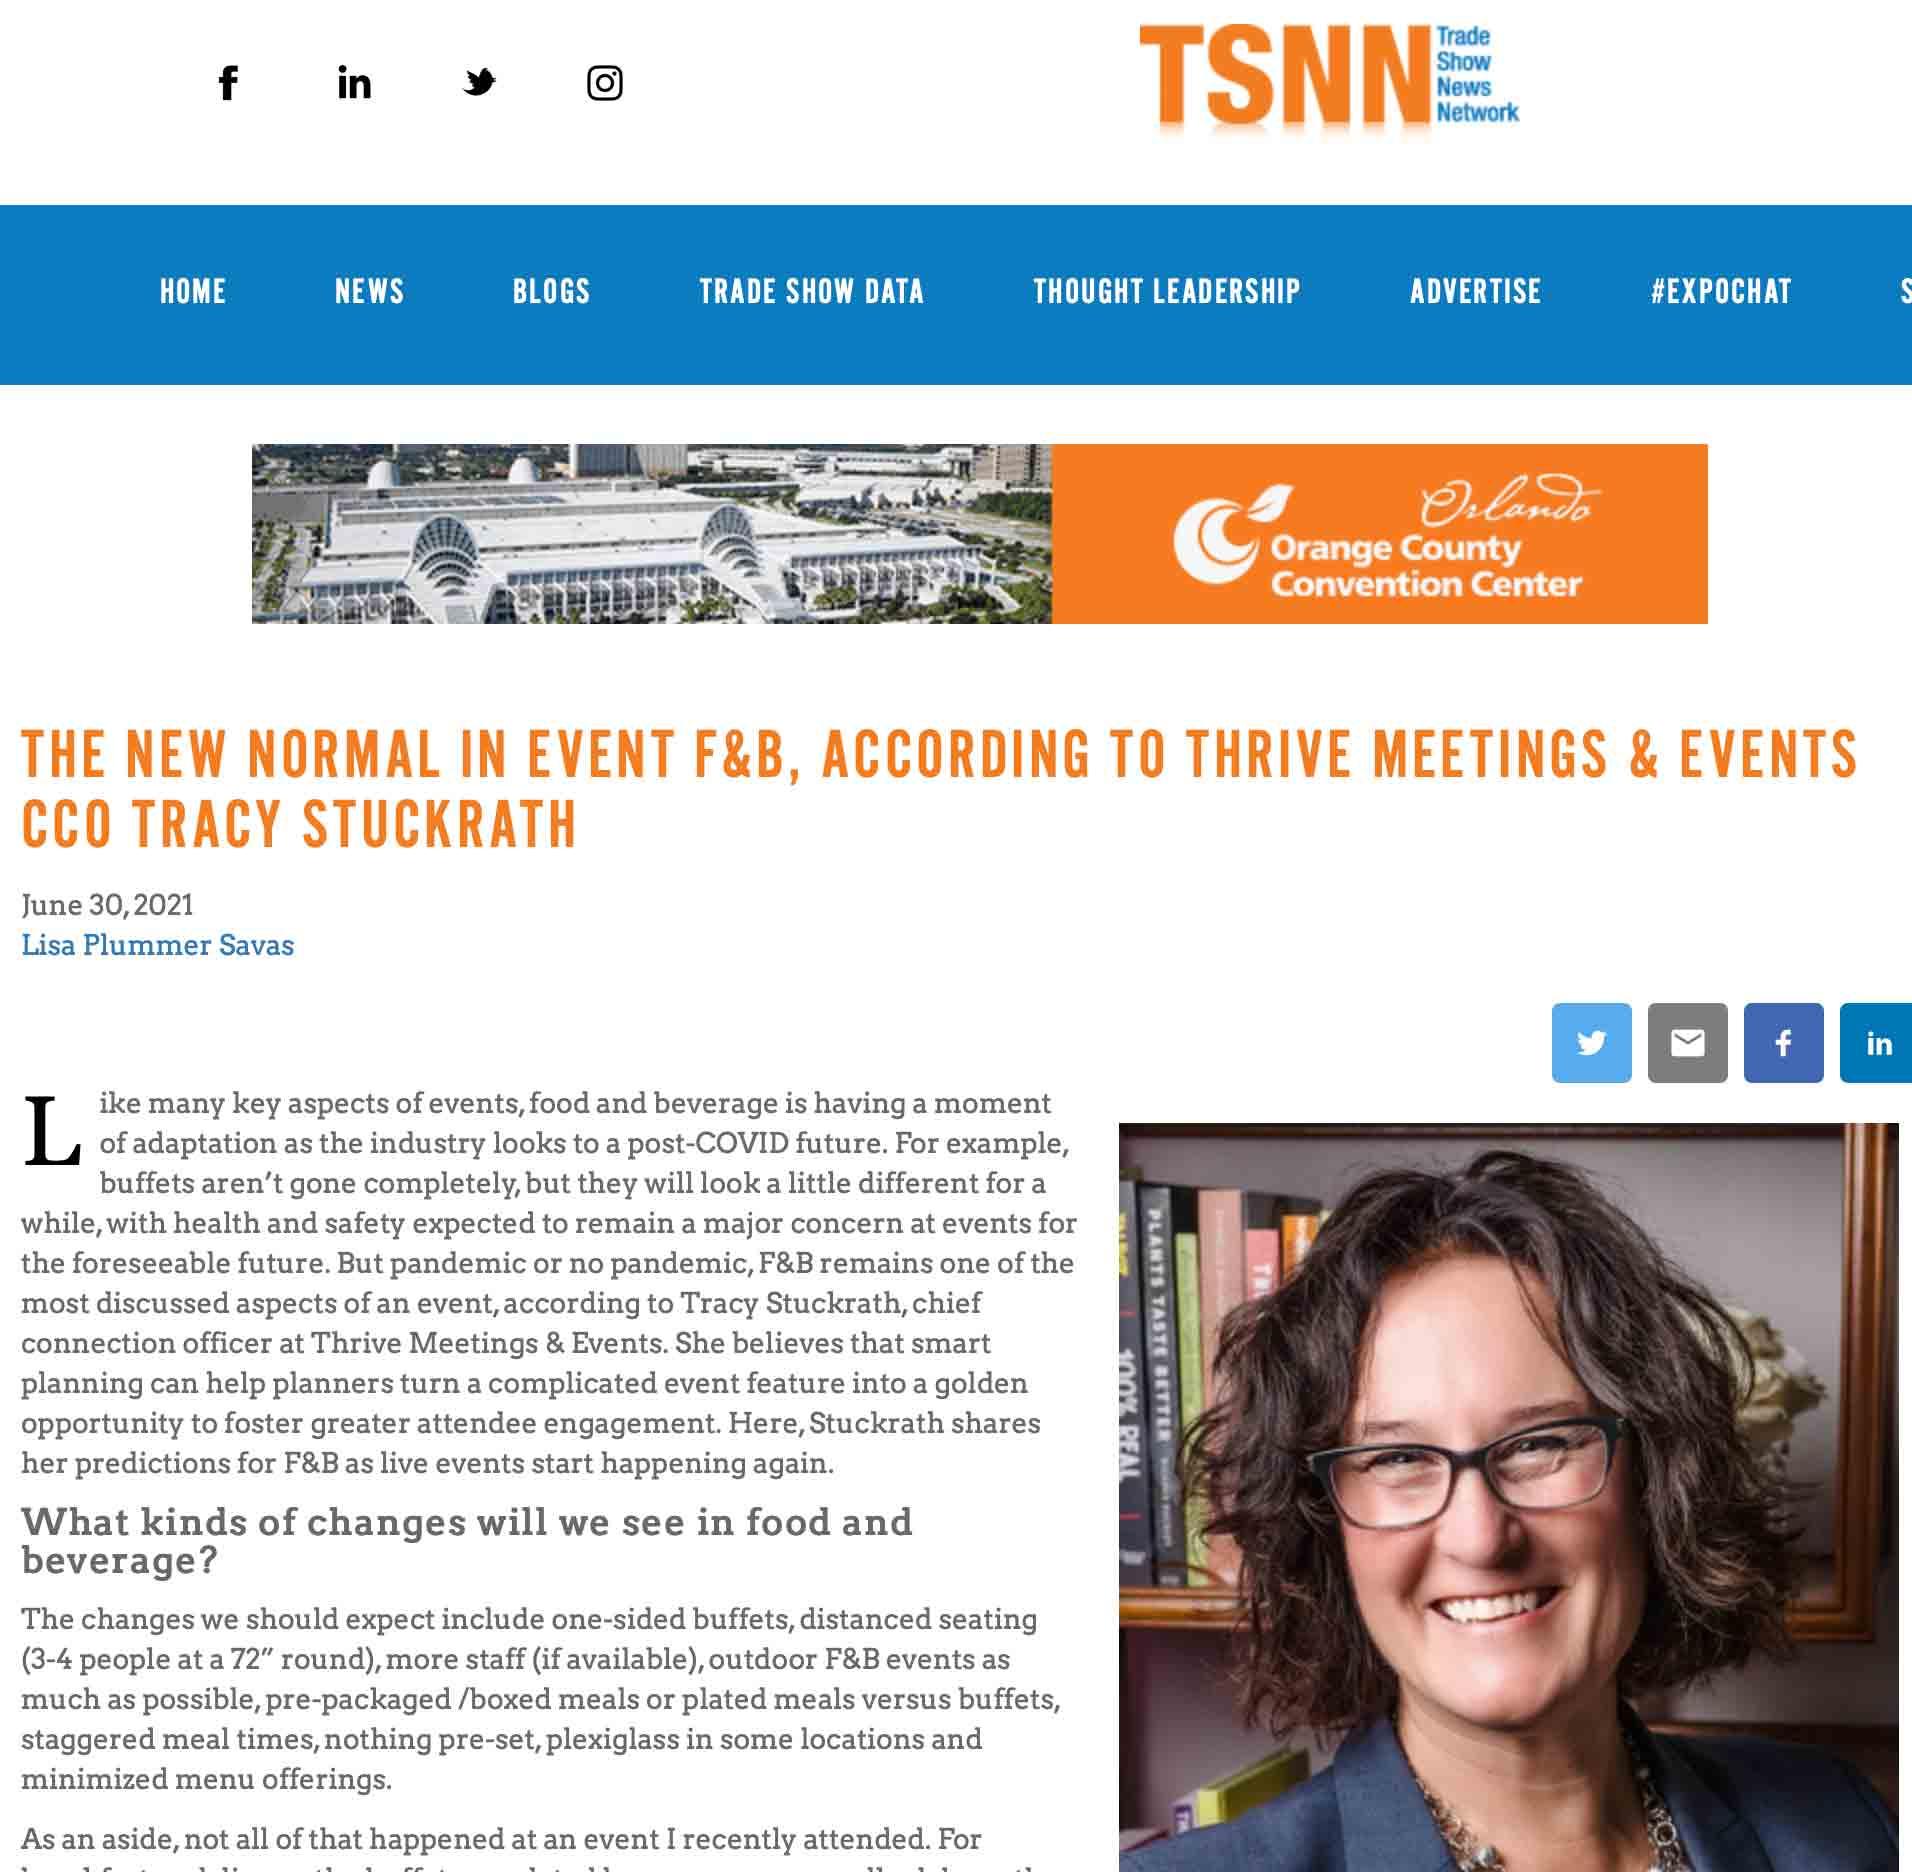 Magazine Headline clip from TSNN with image of Tracy Stuckrath